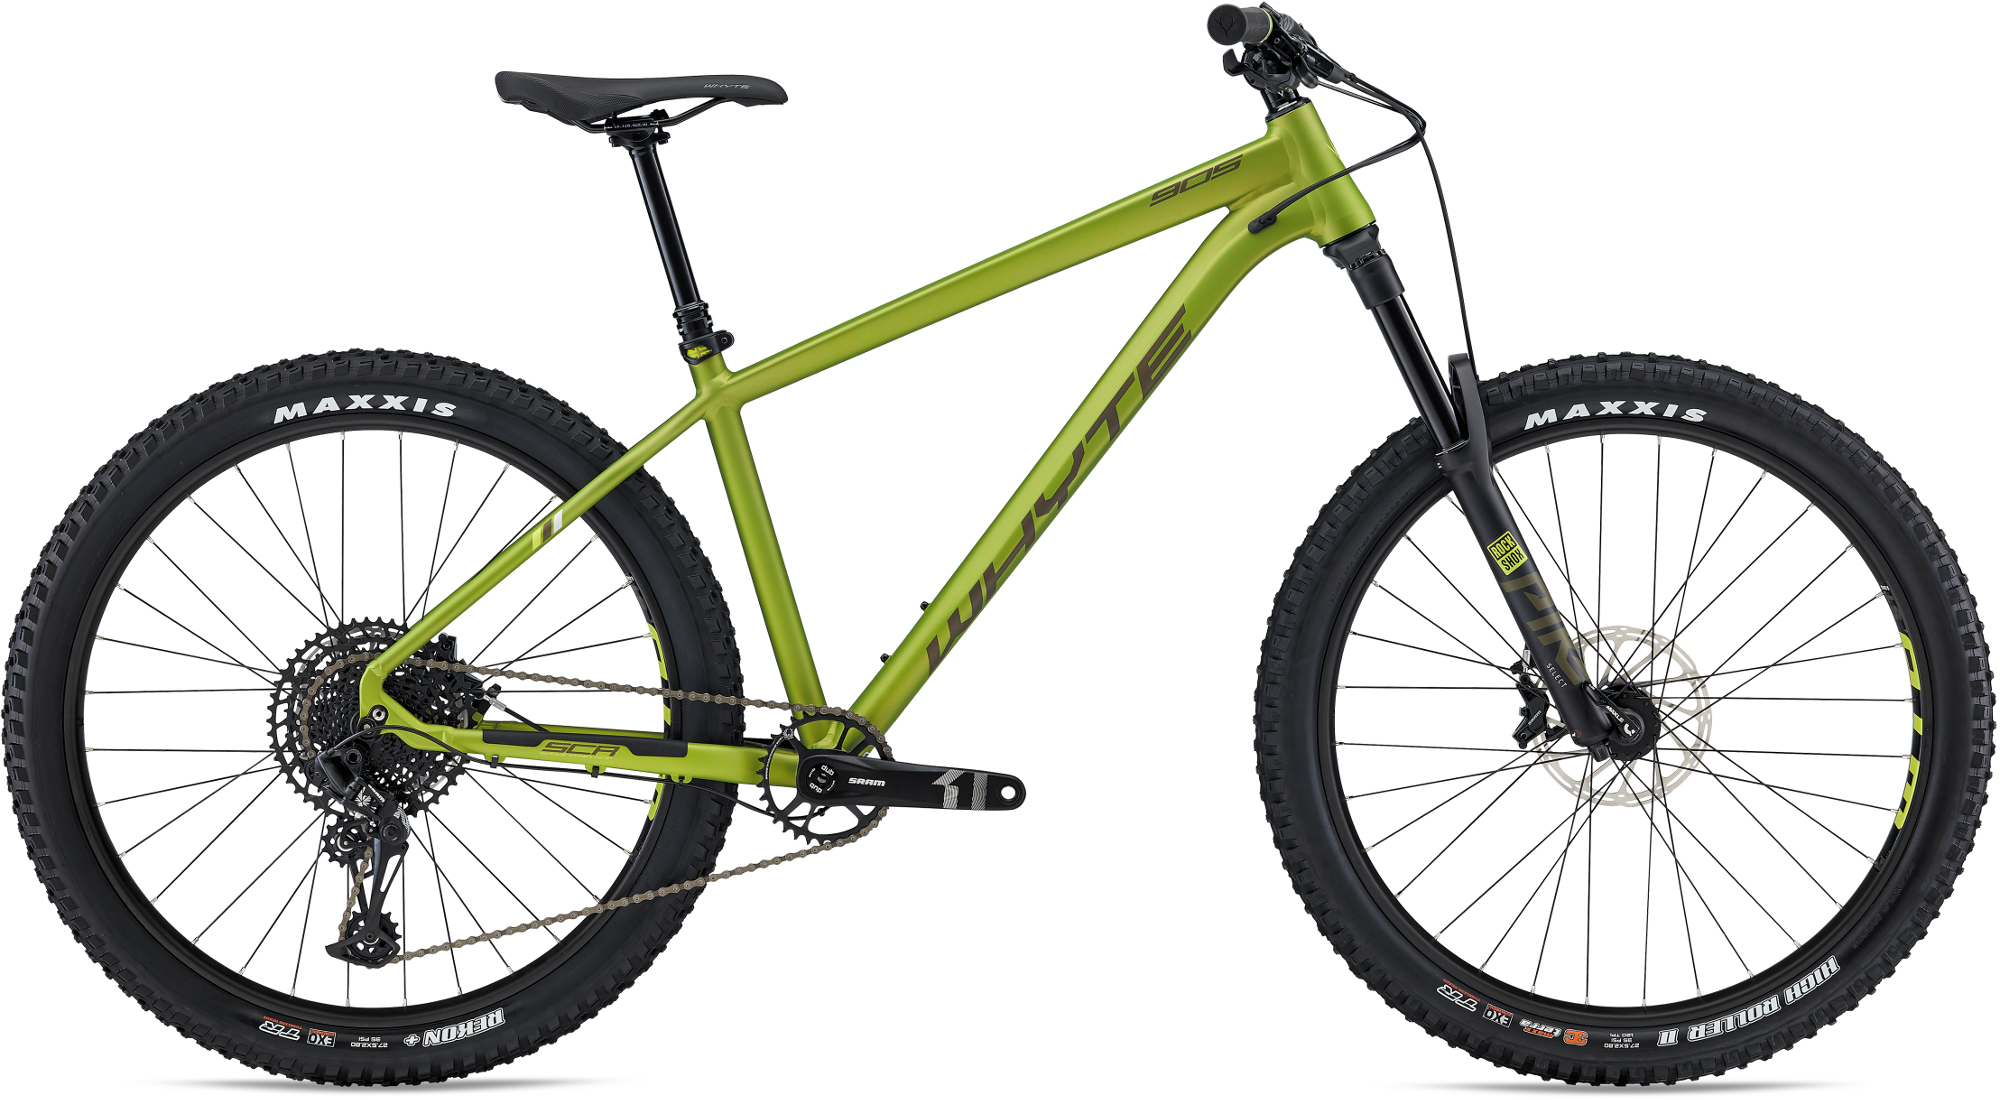 ef139407d85 Whyte 905 27.5 Hardtail Mountain Bike 2017 Orange/Black £1,328.99